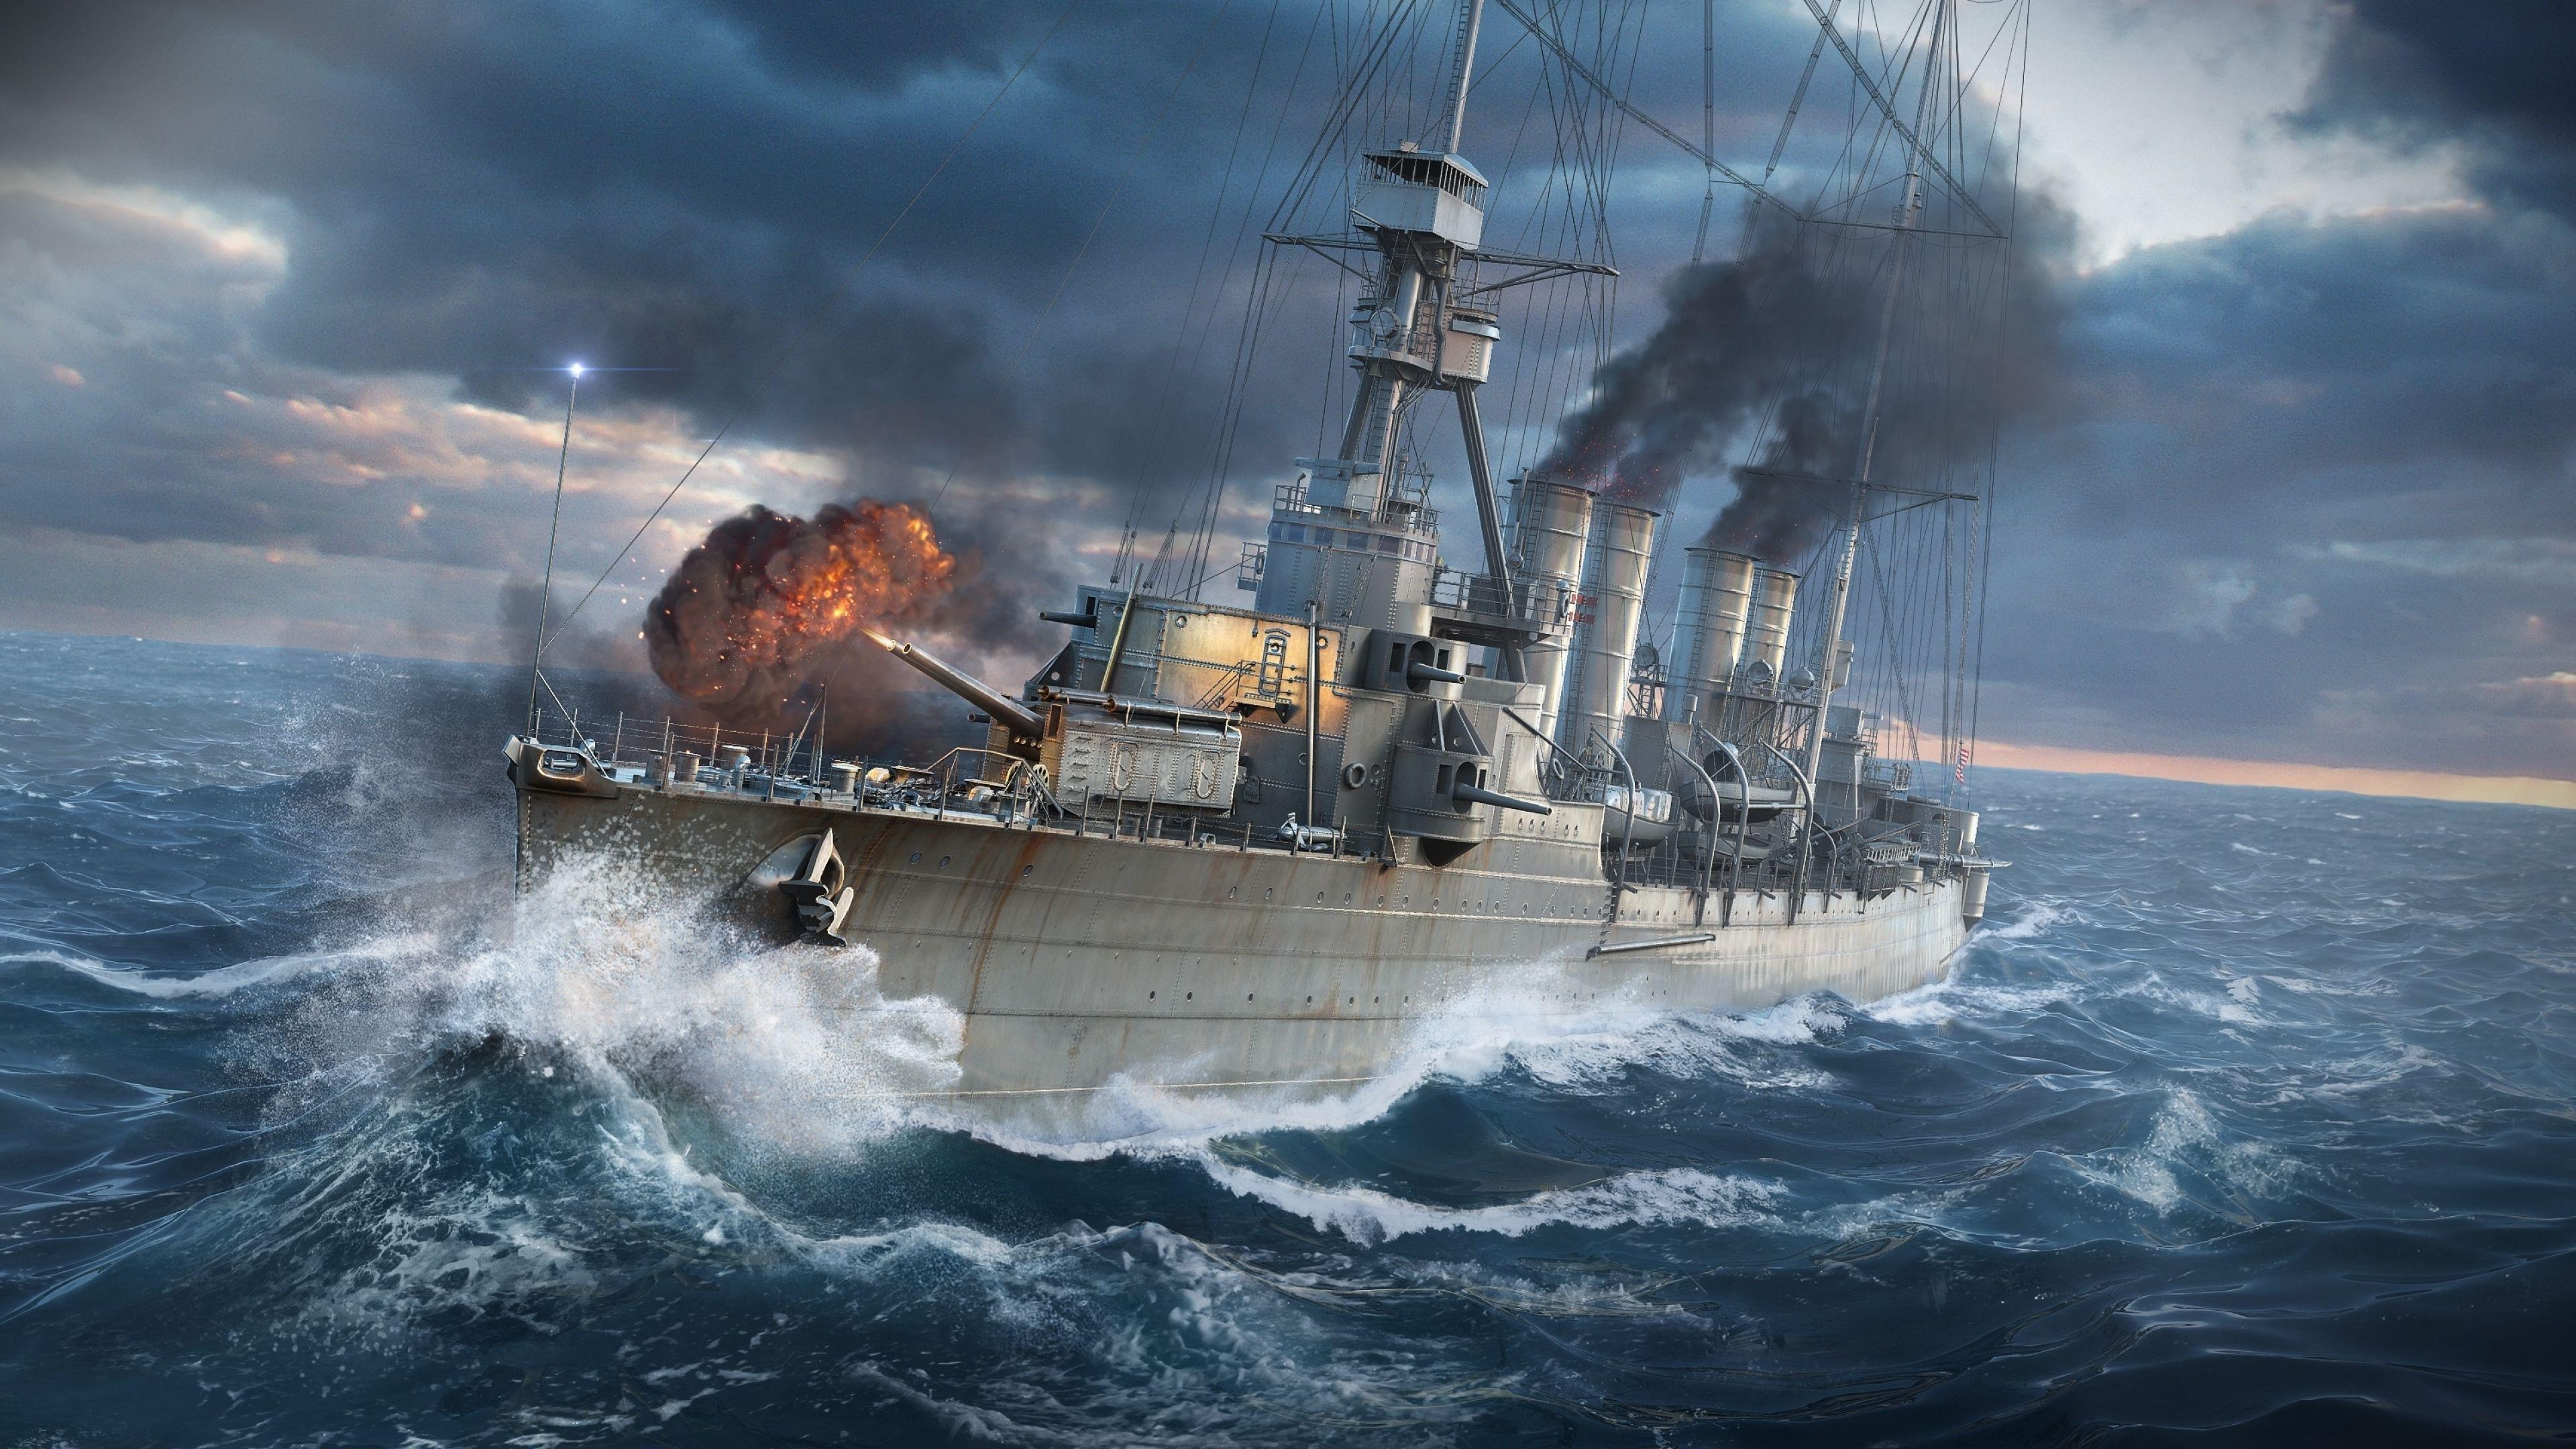 World Of Warships Wallpaper: Warships Wallpapers